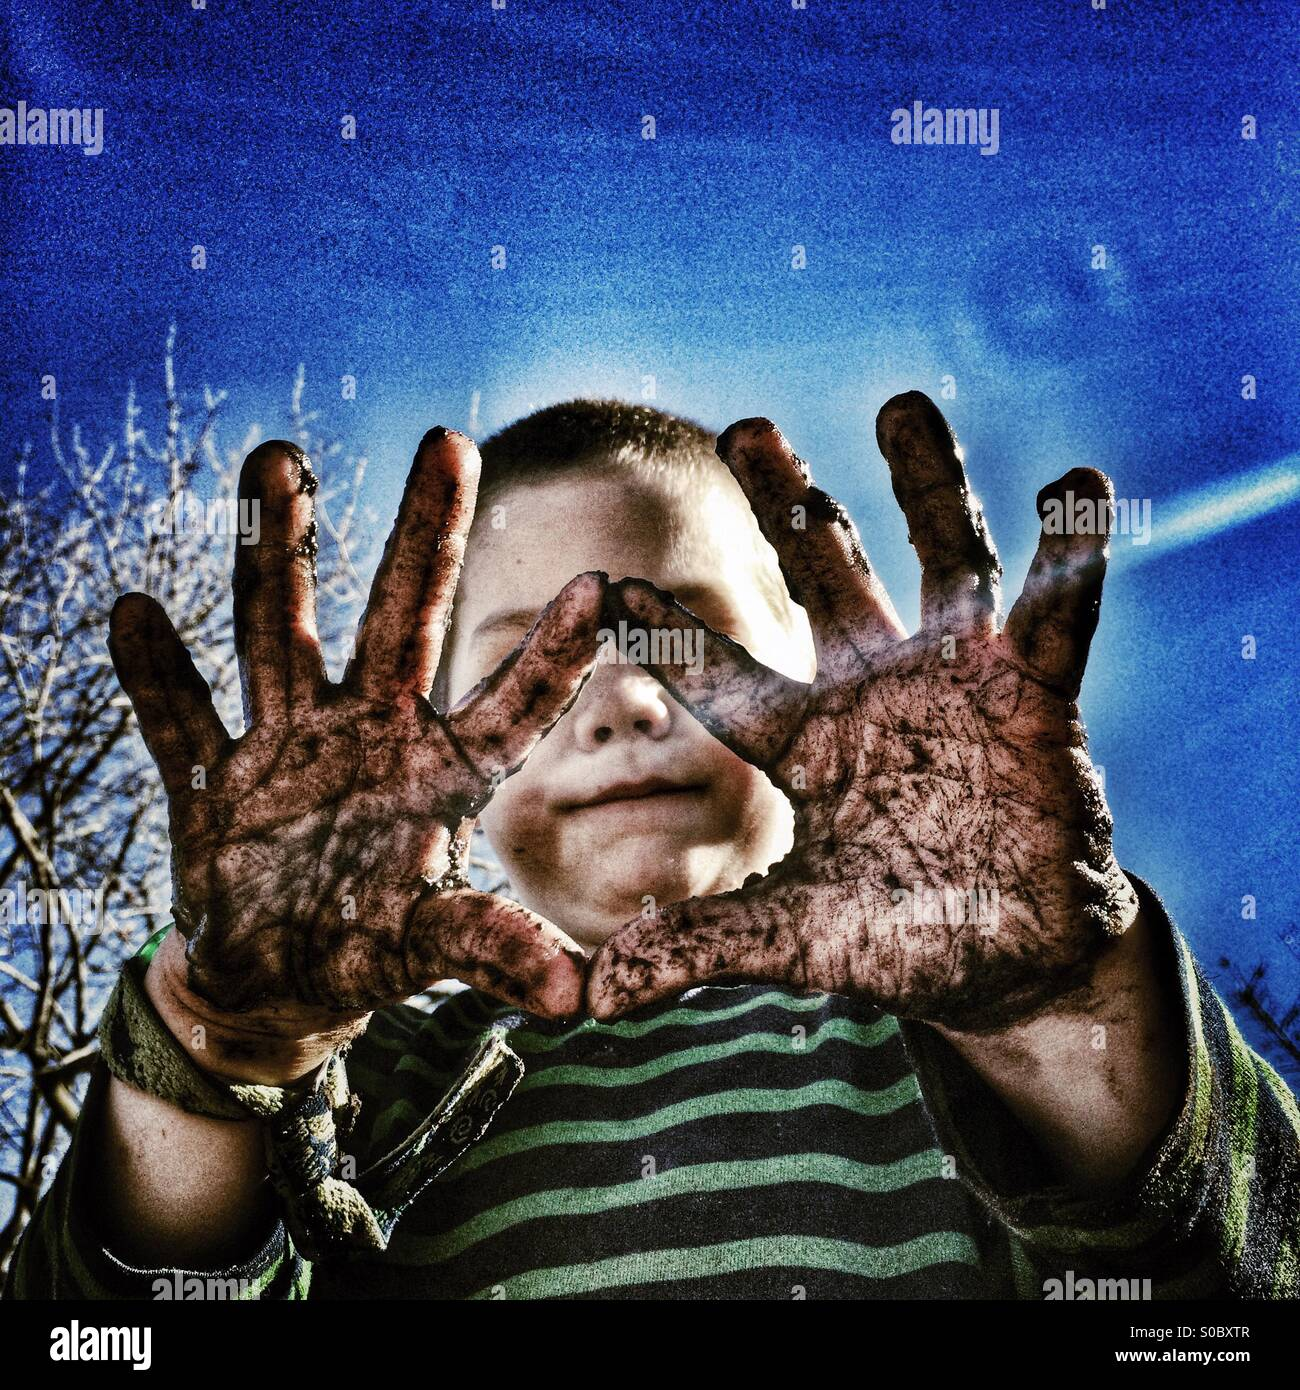 Schlammige Hände Stockbild